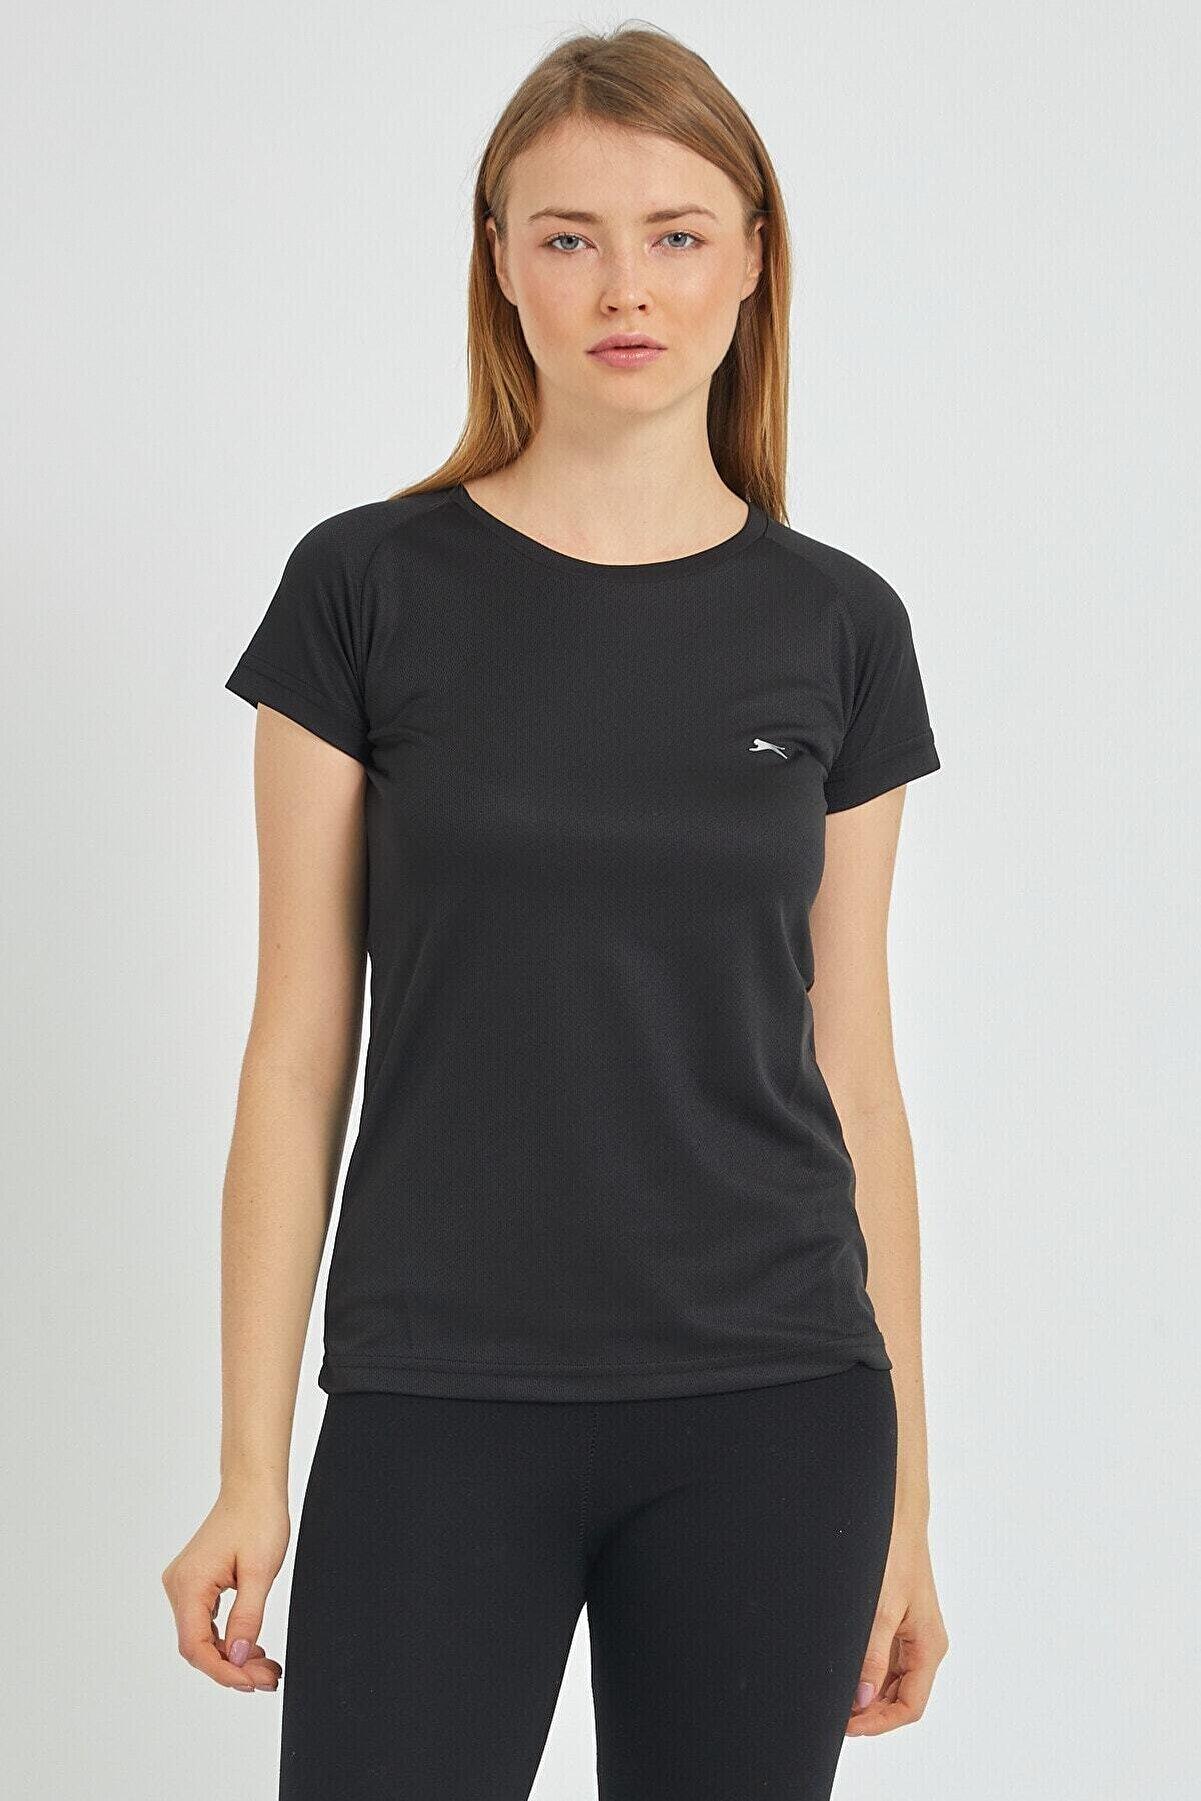 Slazenger Relax Kadın T-shirt Siyah St11te050